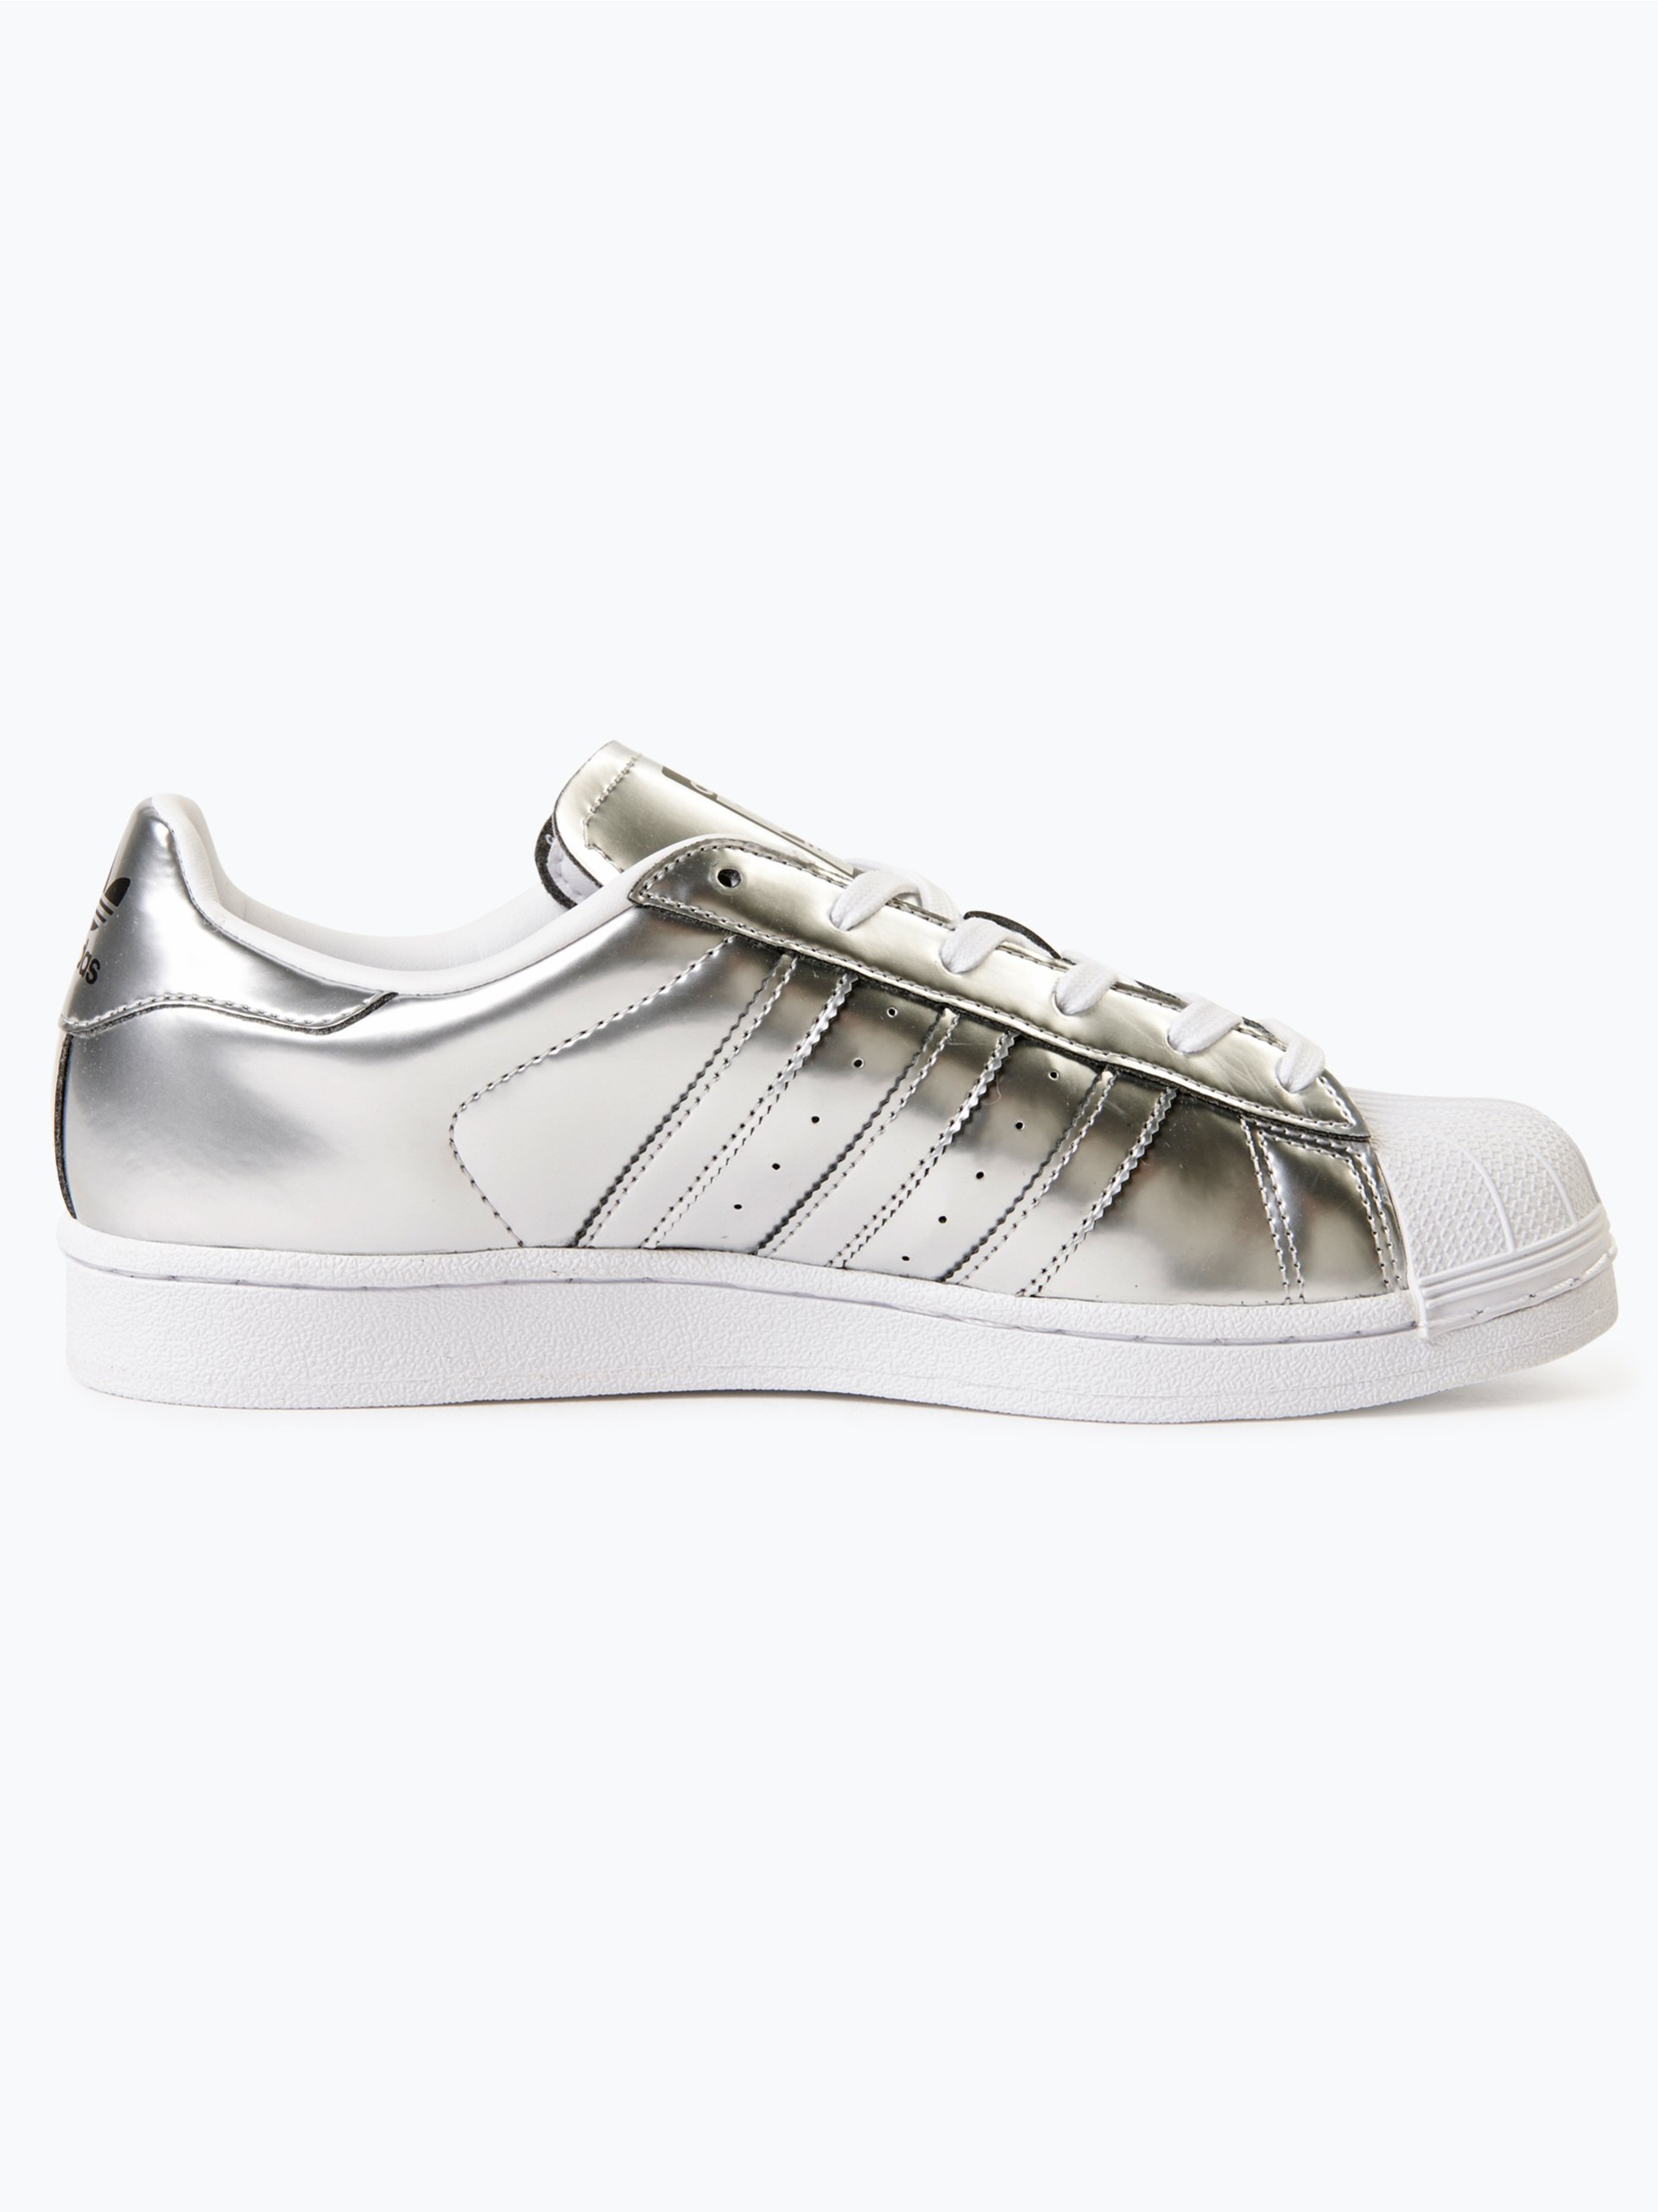 adidas originals damen sneaker superstar w online kaufen vangraaf com. Black Bedroom Furniture Sets. Home Design Ideas